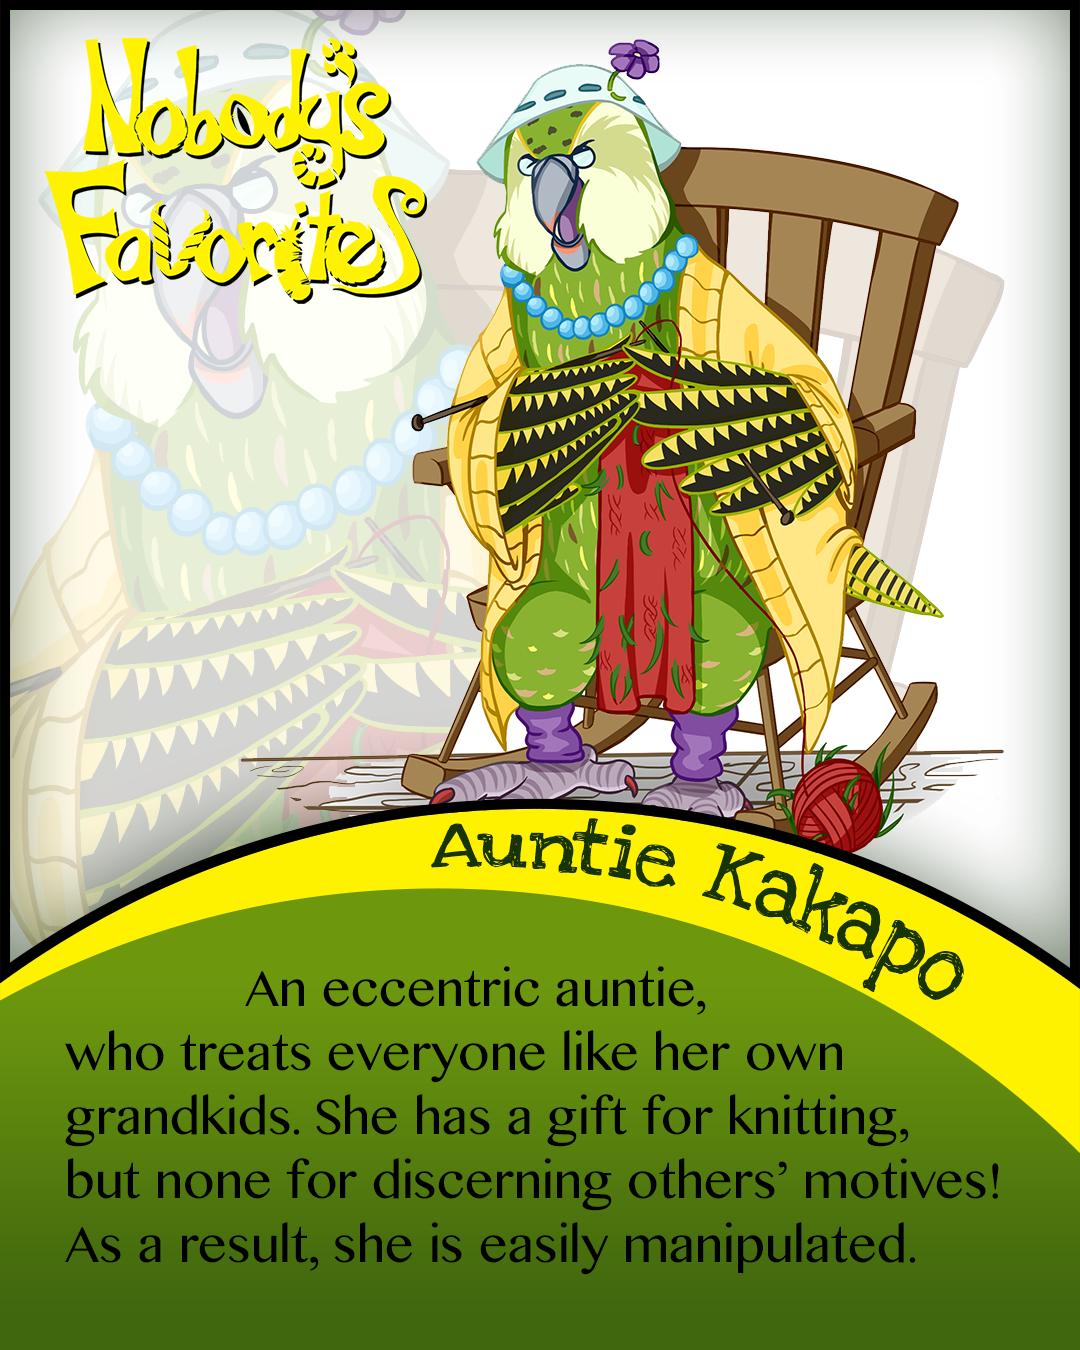 Auntie kakapo's Bio